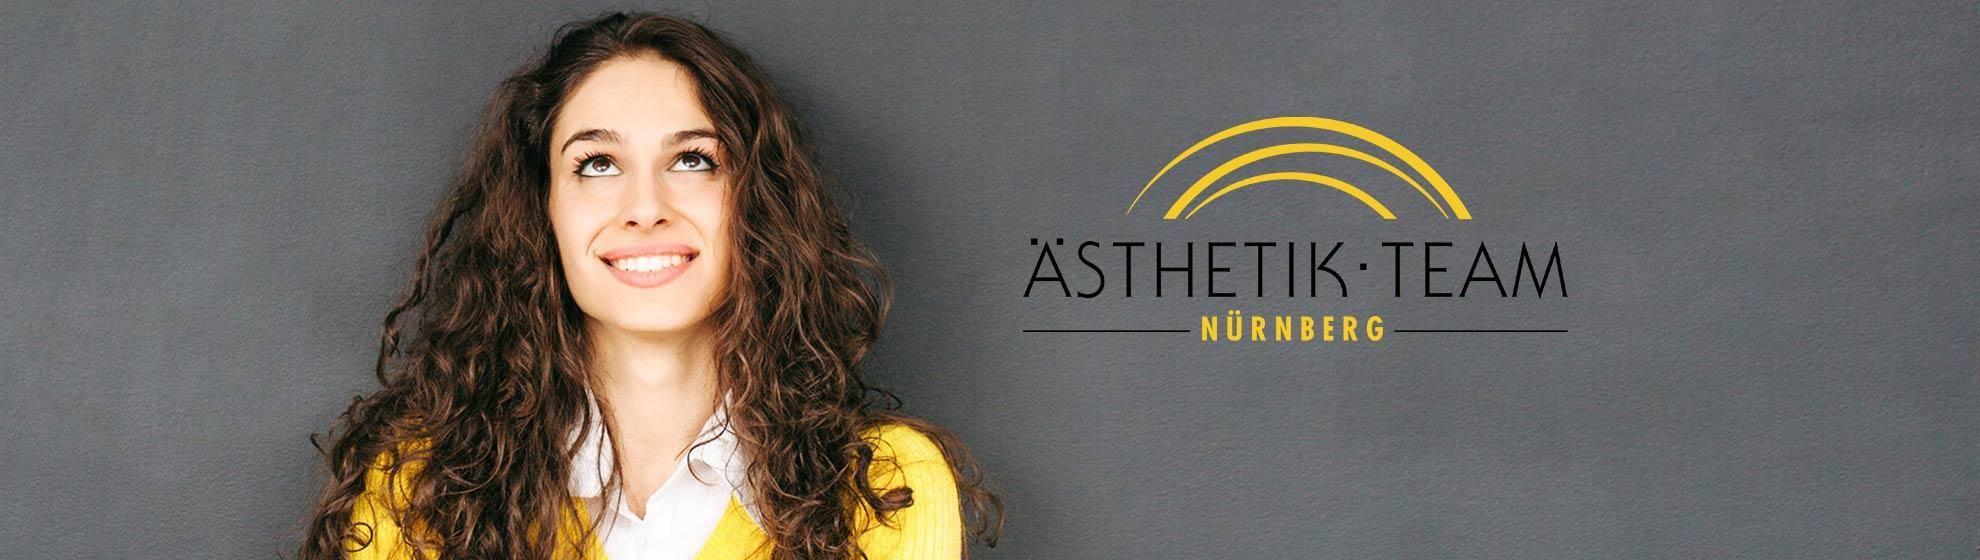 Ästhetik-Team-Nürnberg